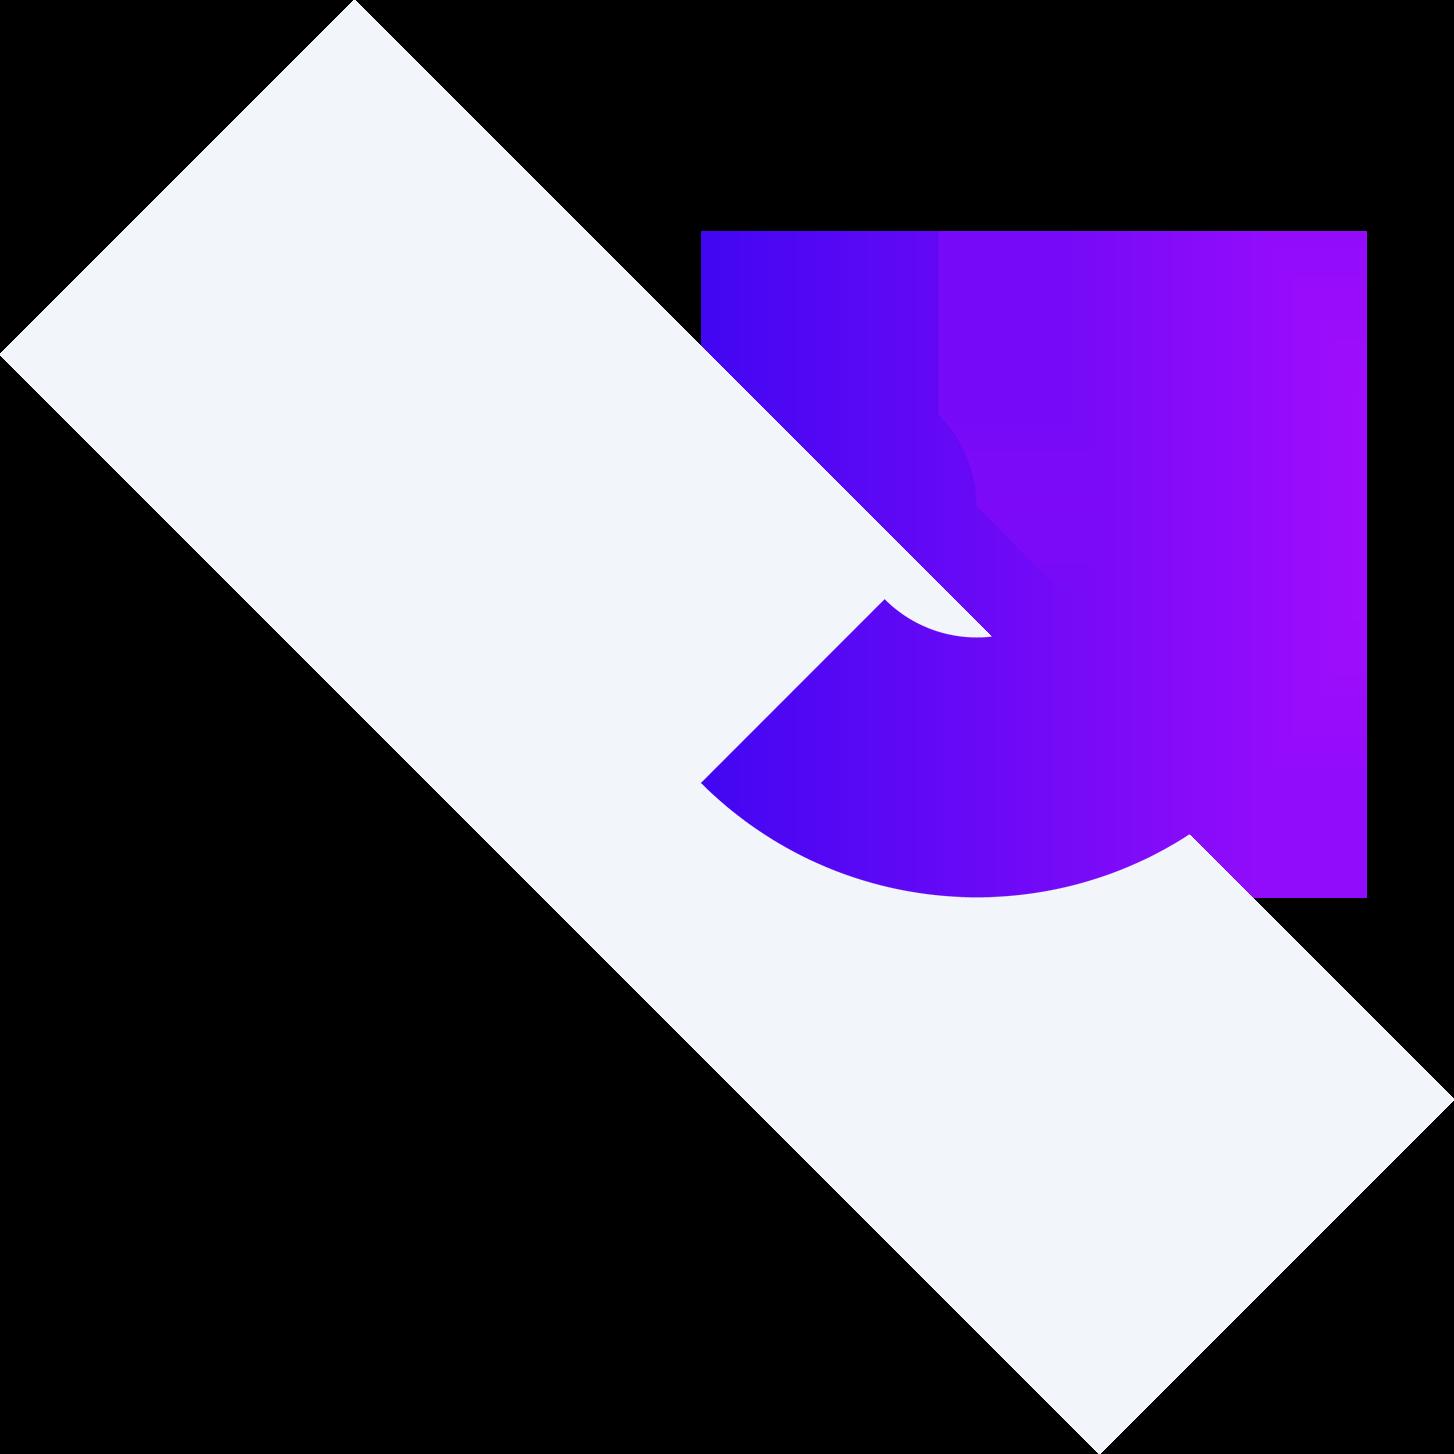 Grey rectangle, purple semicircle